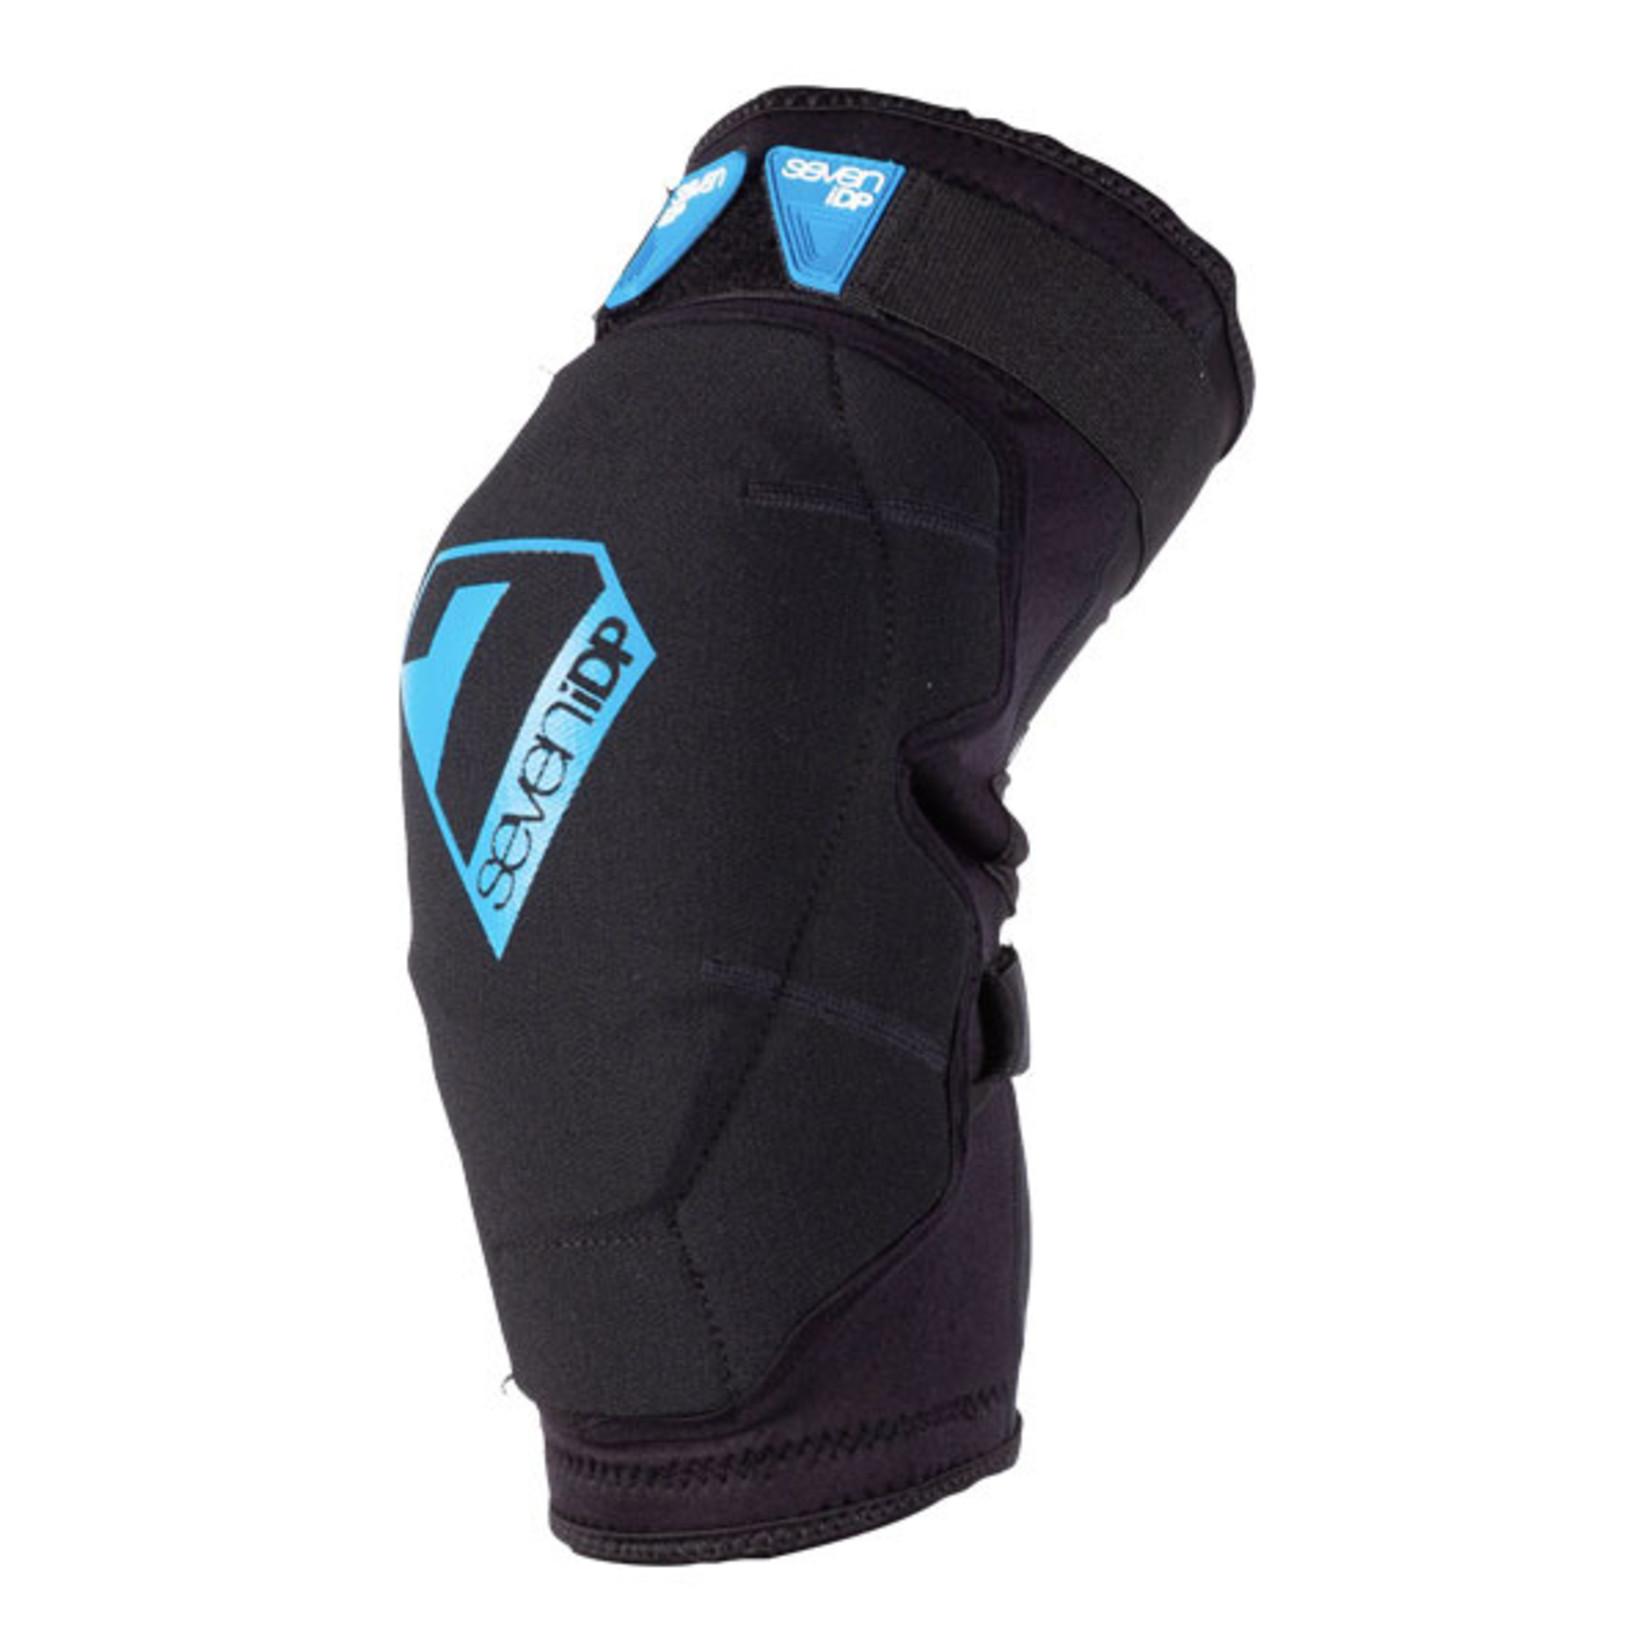 7 Protection - Flex Knee